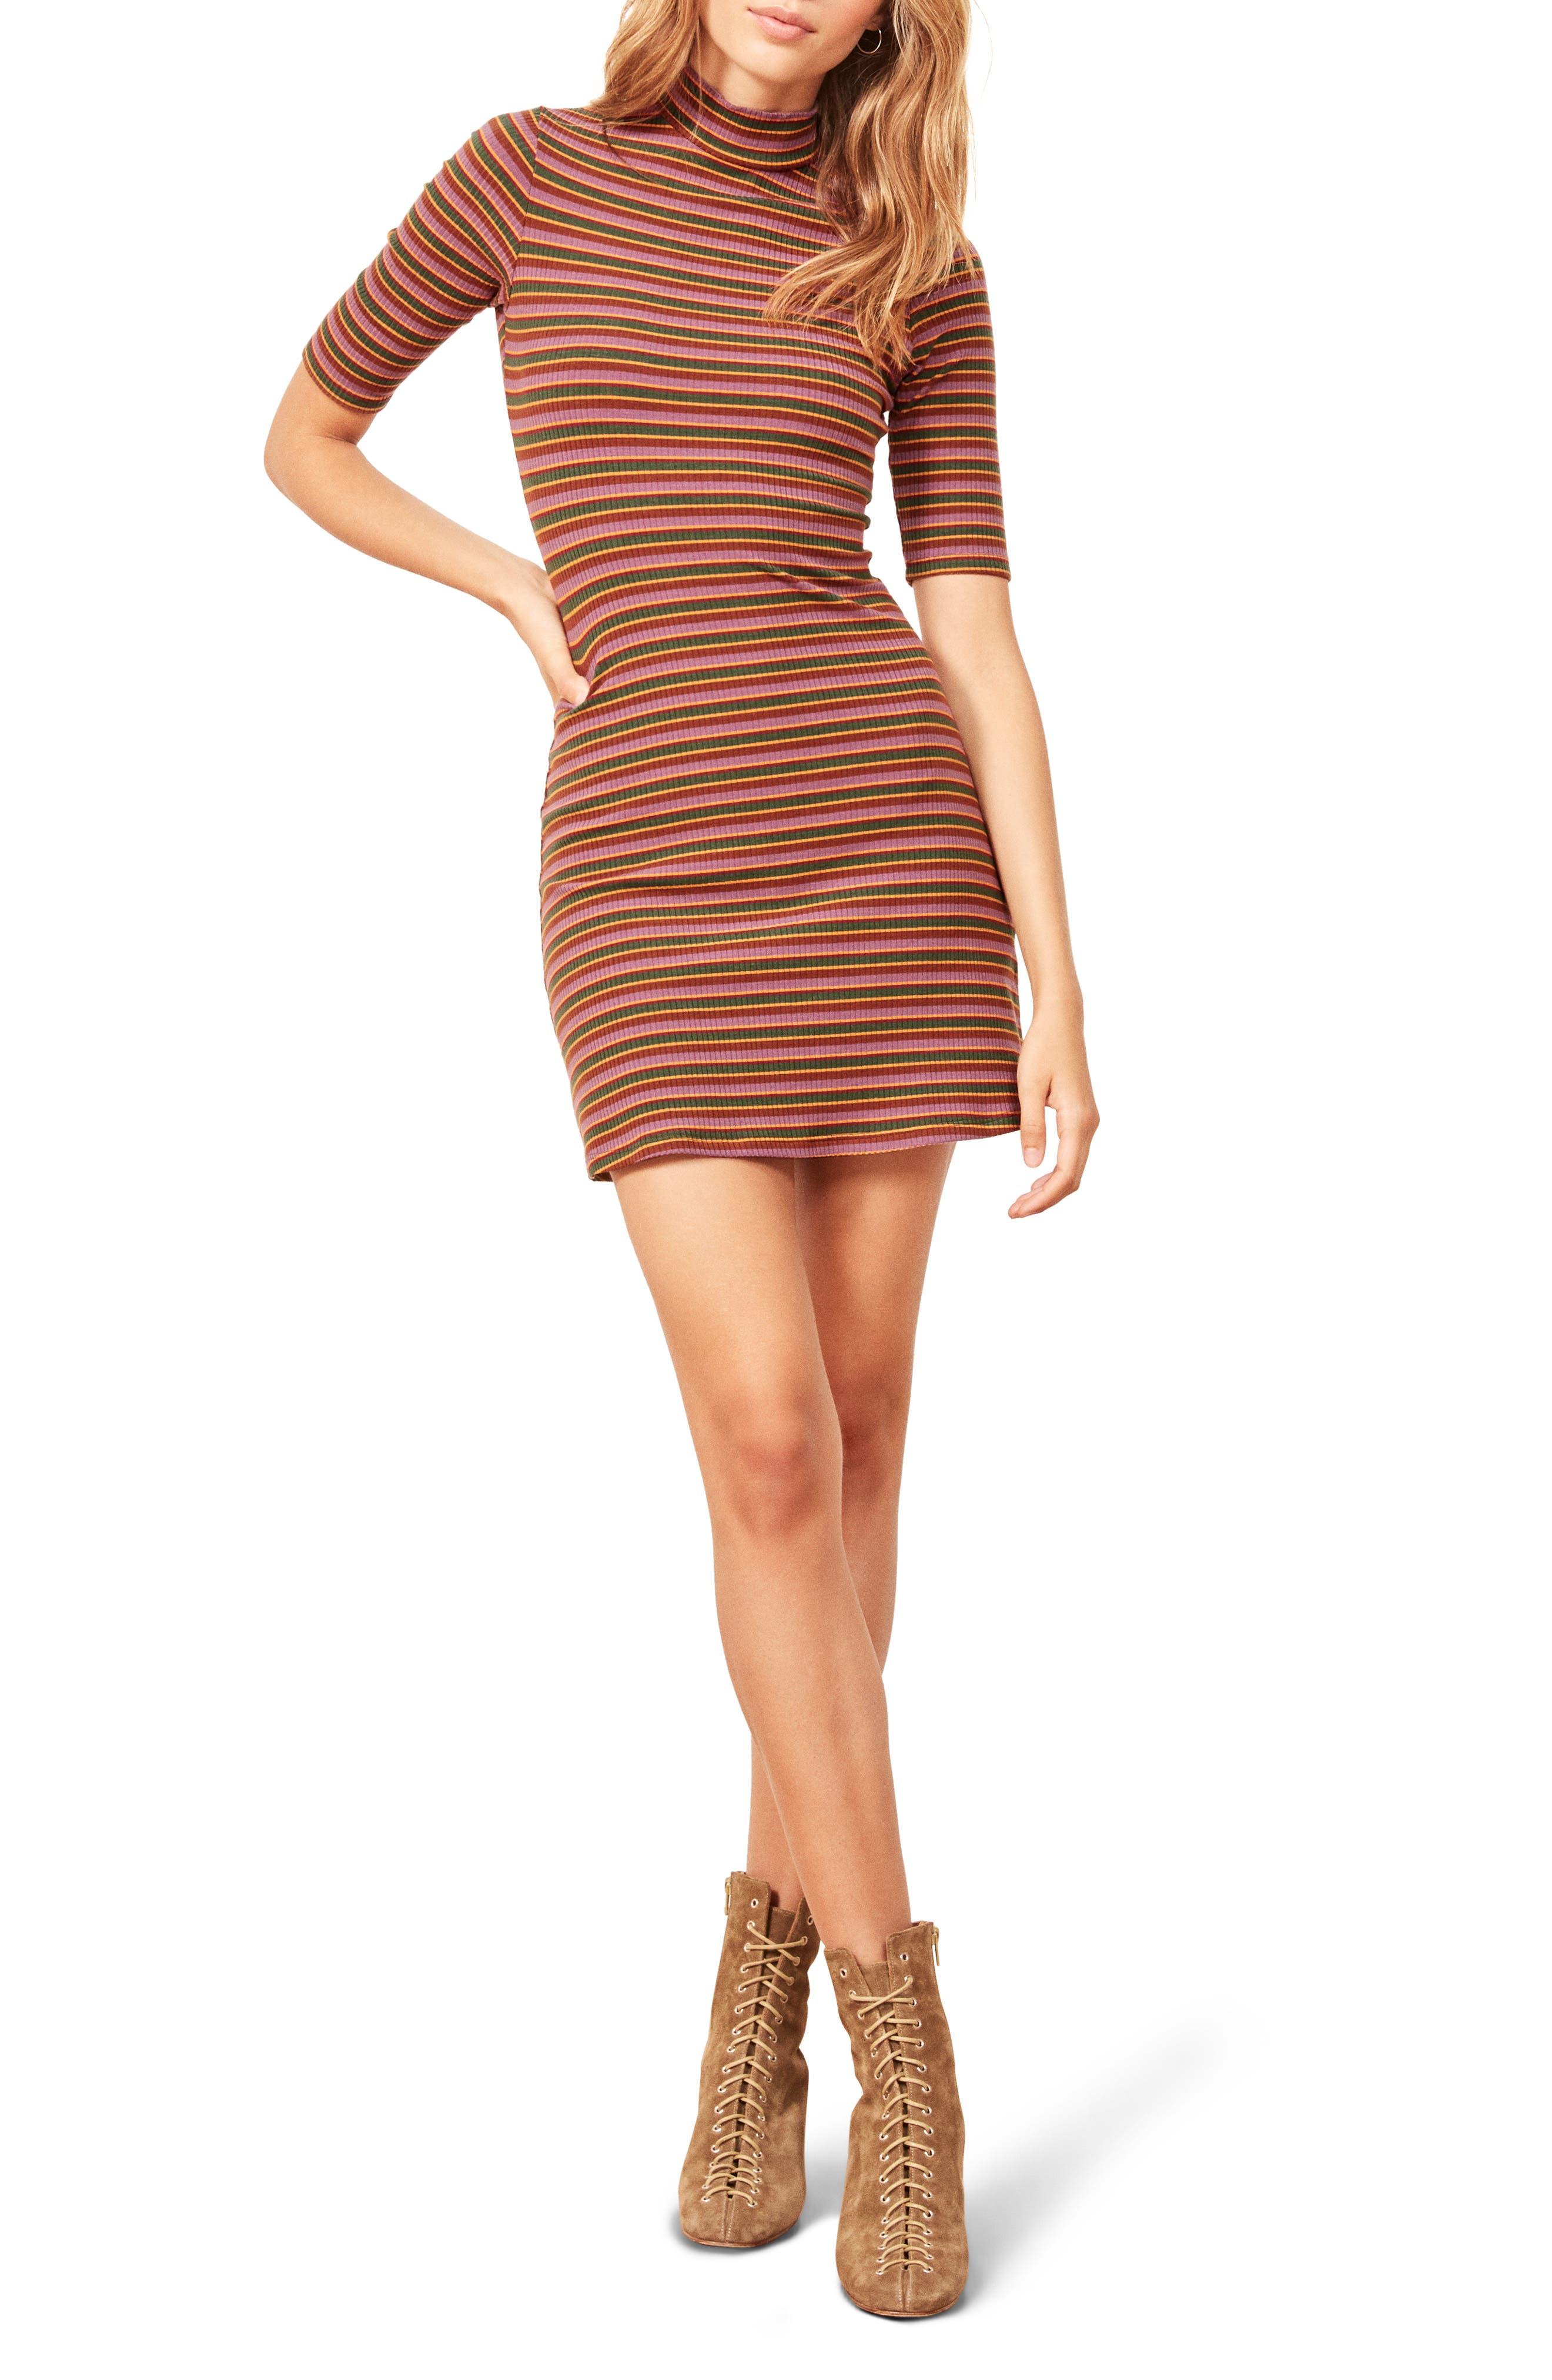 Mod Sweater Dress,                             Main thumbnail 1, color,                             GABRIEL STRIPE